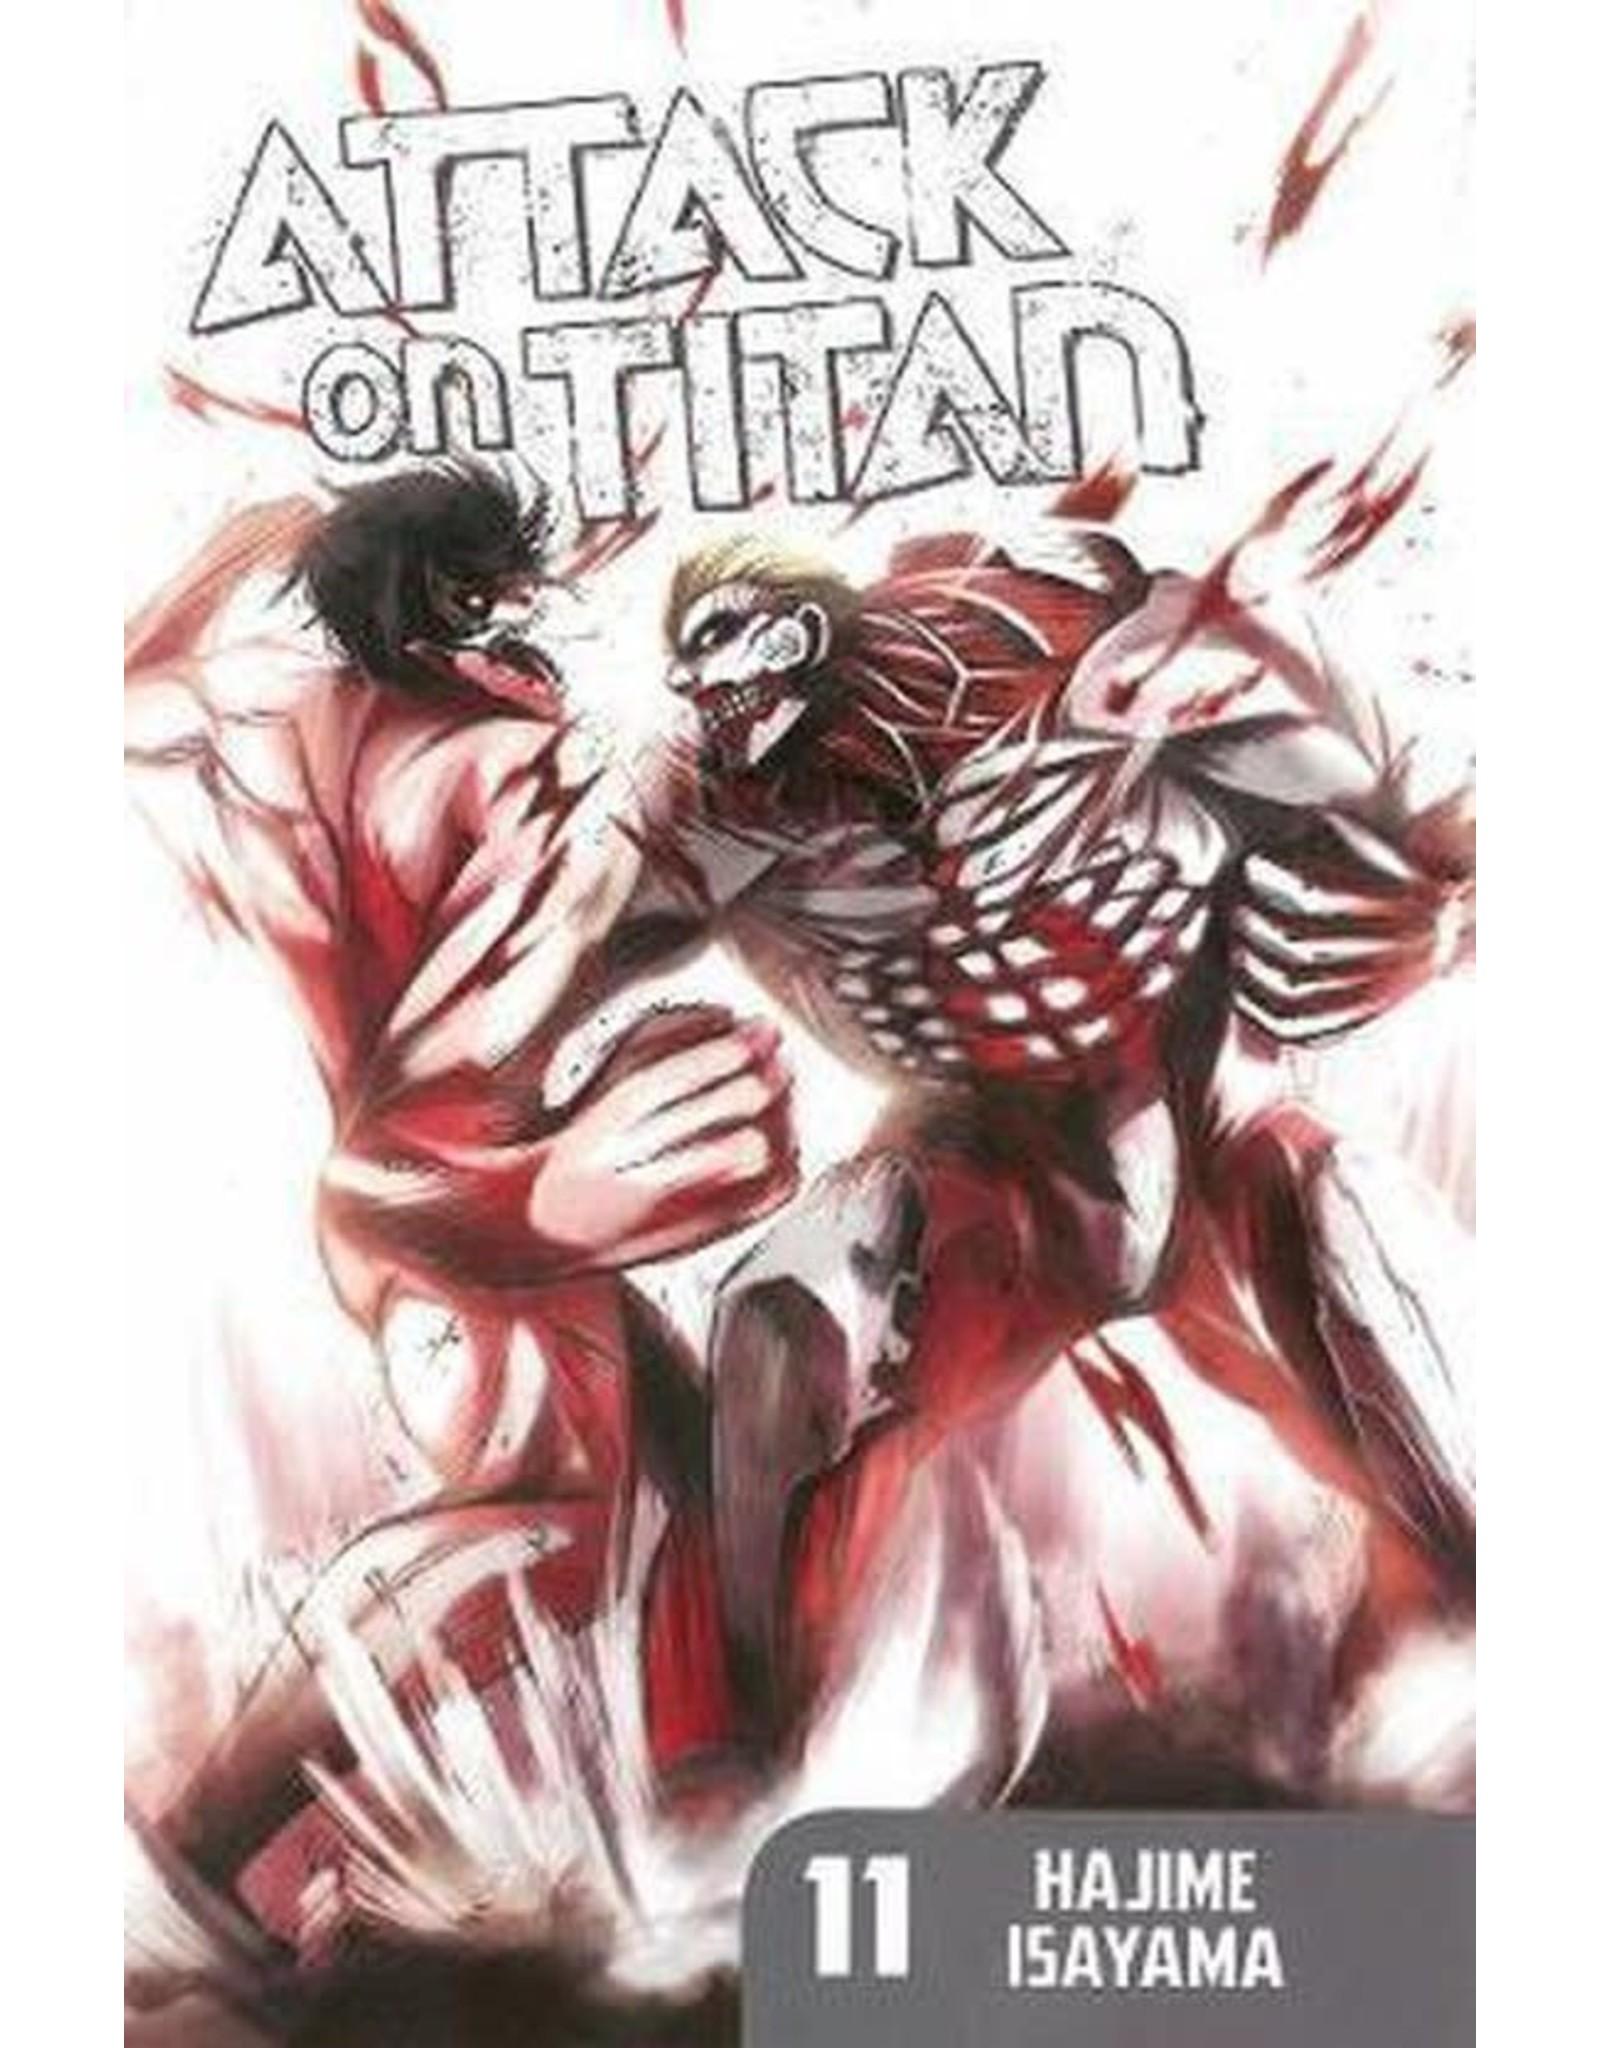 Attack on Titan 11 (English) - Manga